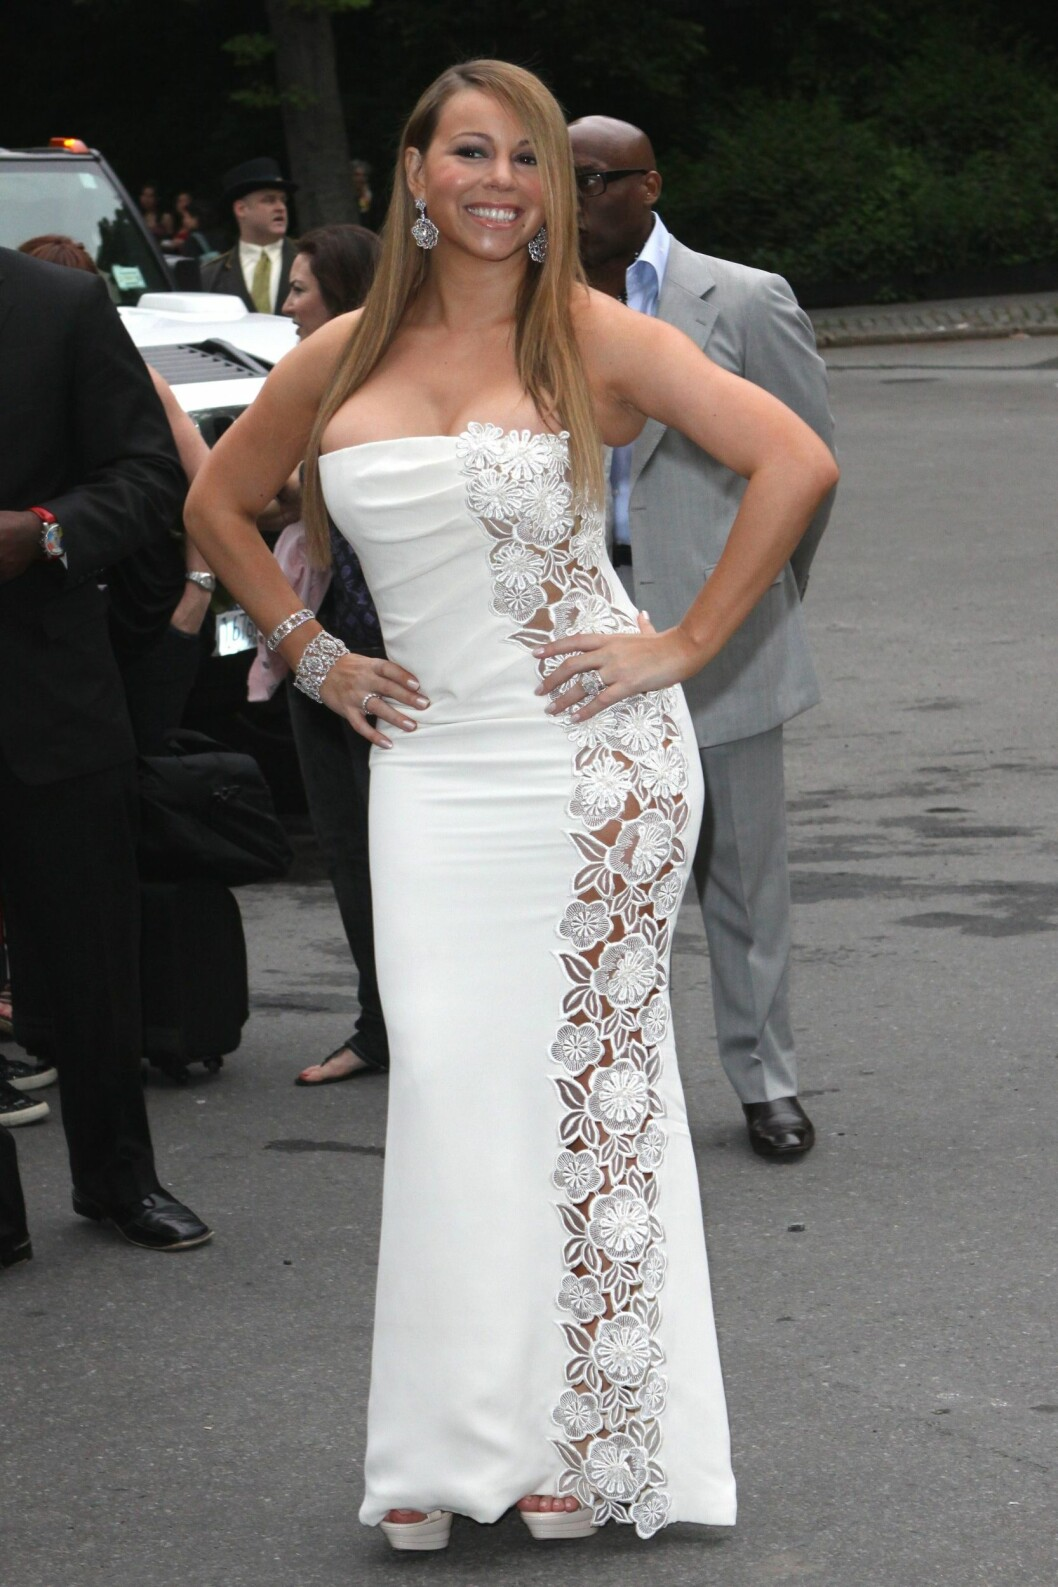 <strong>SPRETNE PUPPER:</strong> Popstjernen Mariah Carey kunne med fordel toned ned denne harry havfruekjolen sin noen hakk.  Foto: All Over Press